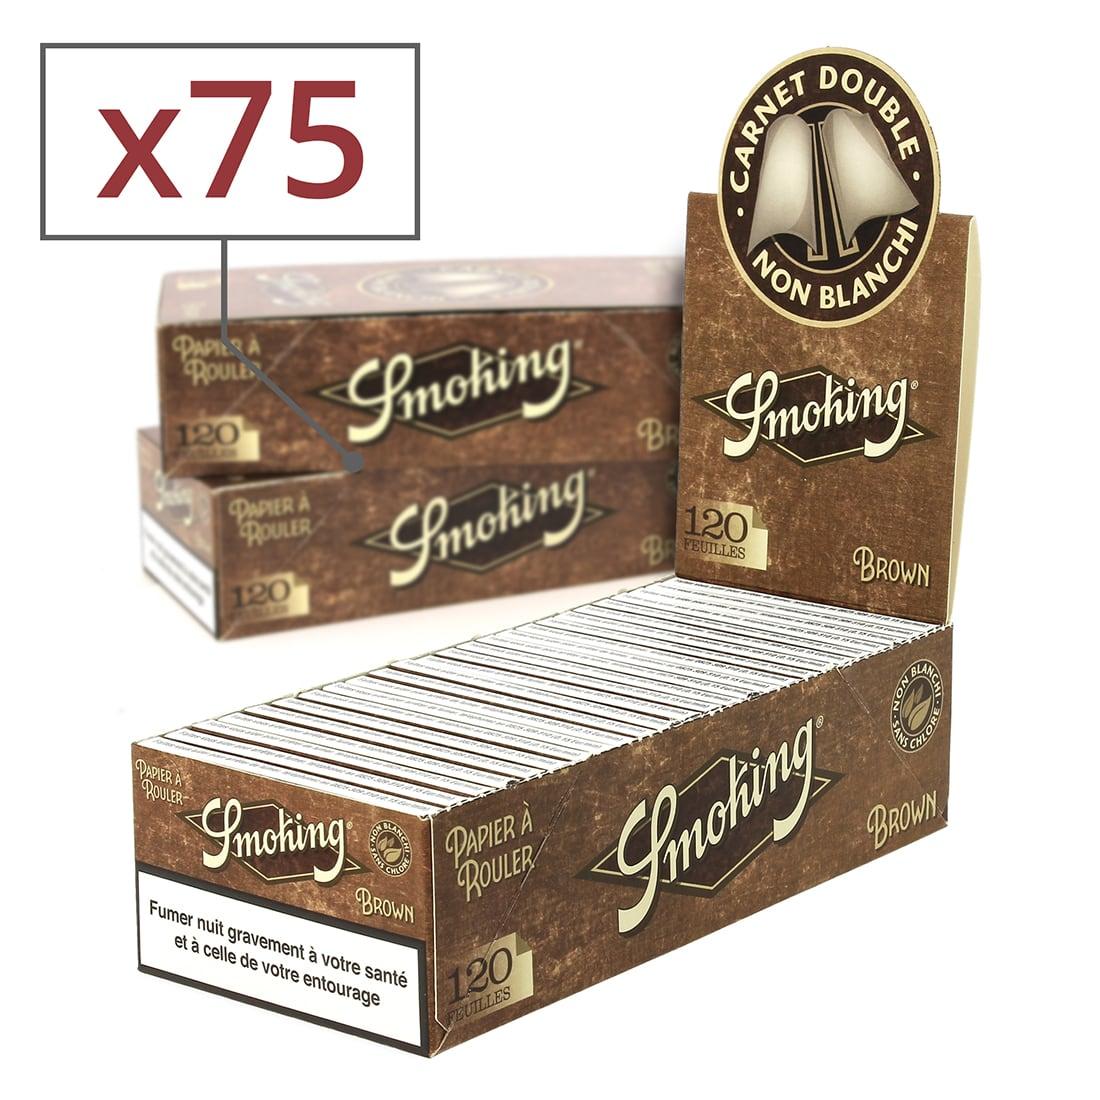 Photo de Papier à rouler Smoking Brown Régular x 25 PACK de 3